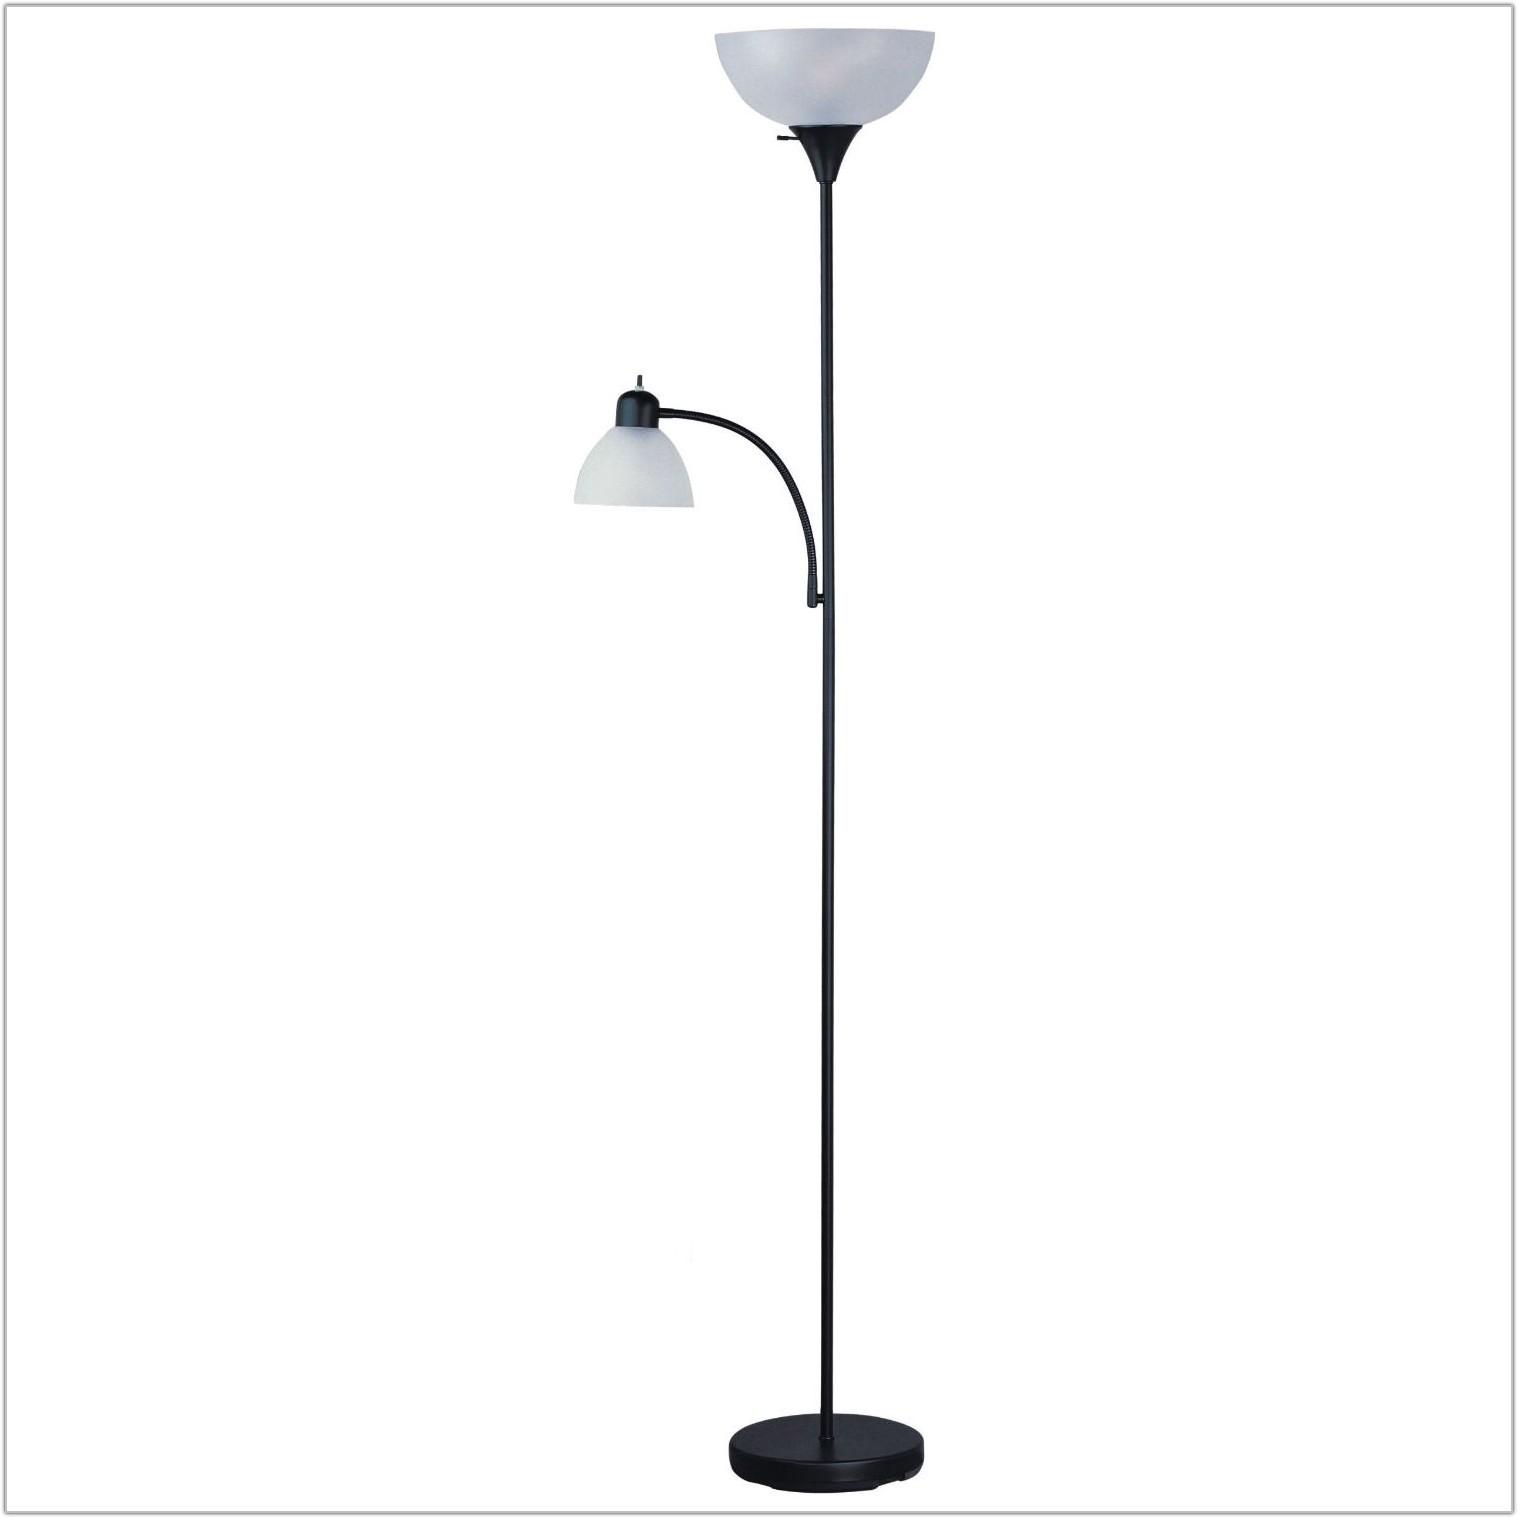 72 Inch Tall Floor Lamp